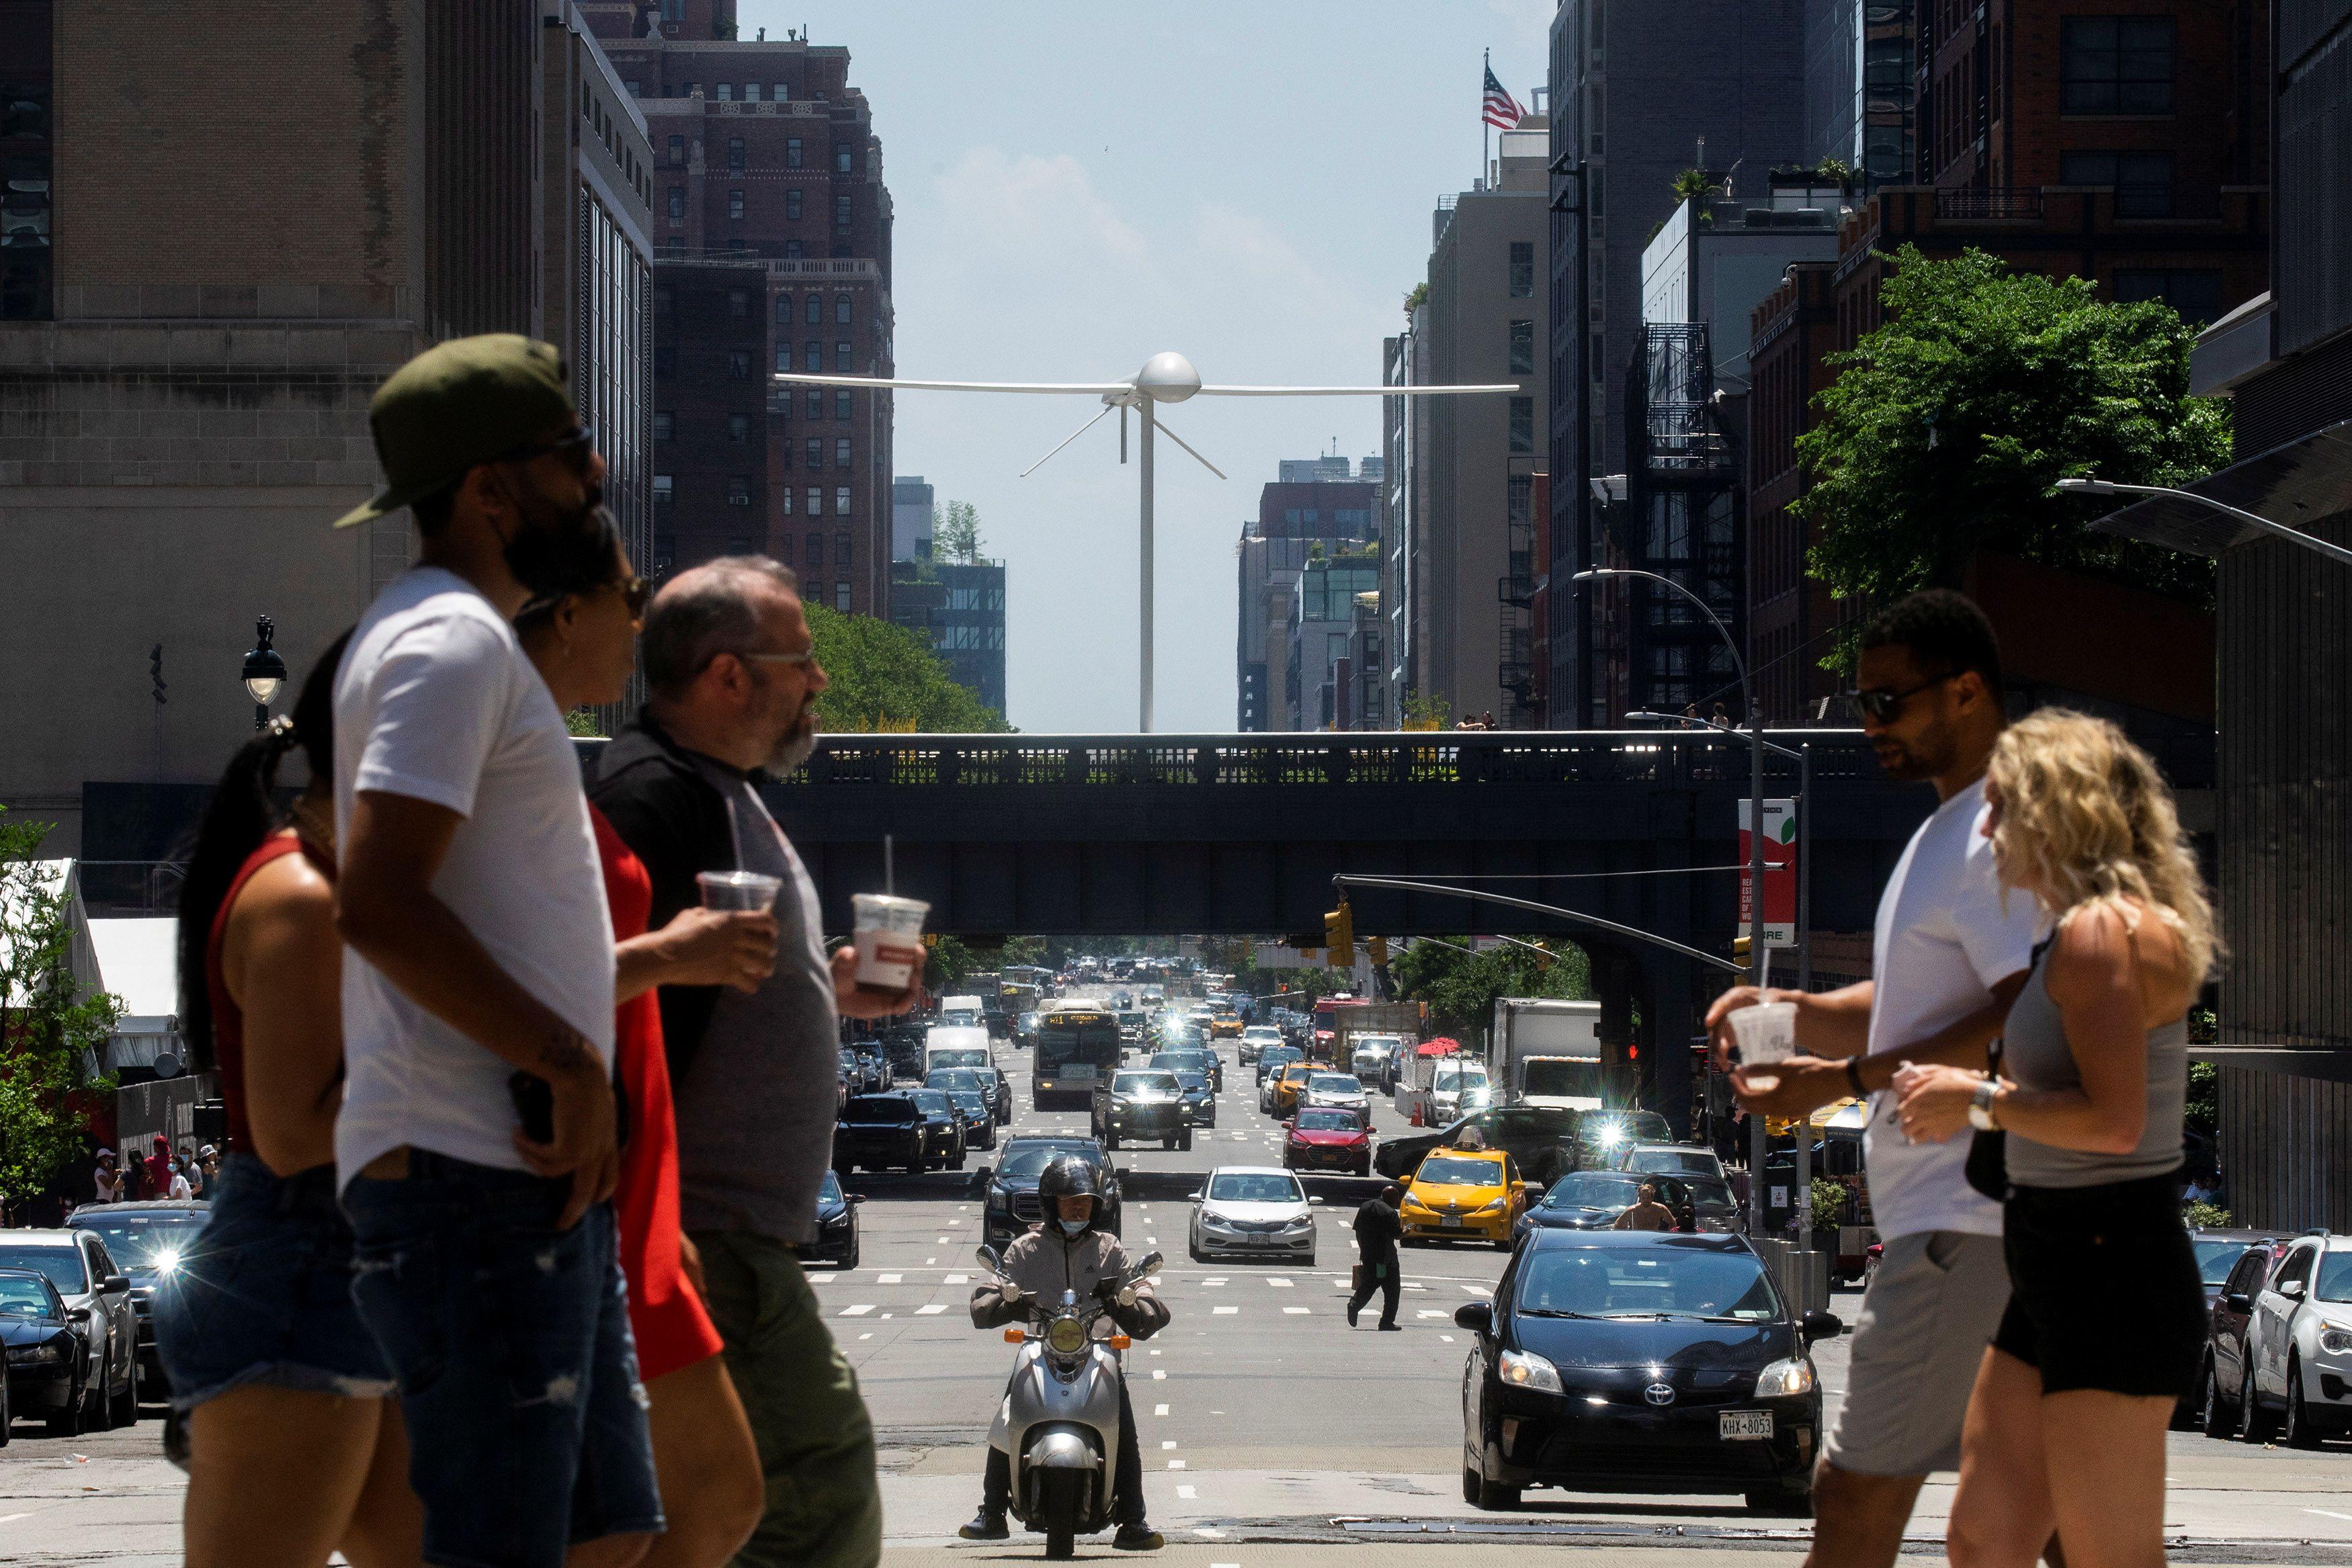 "A sculpture by artist Sam Durant called ""Untitled"" (drone), a fiberglass sculpture depicting a Predator drone, is seen over the High Line park in Manhattan borough of New York, U.S., June 6, 2021. REUTERS/Eduardo Munoz"